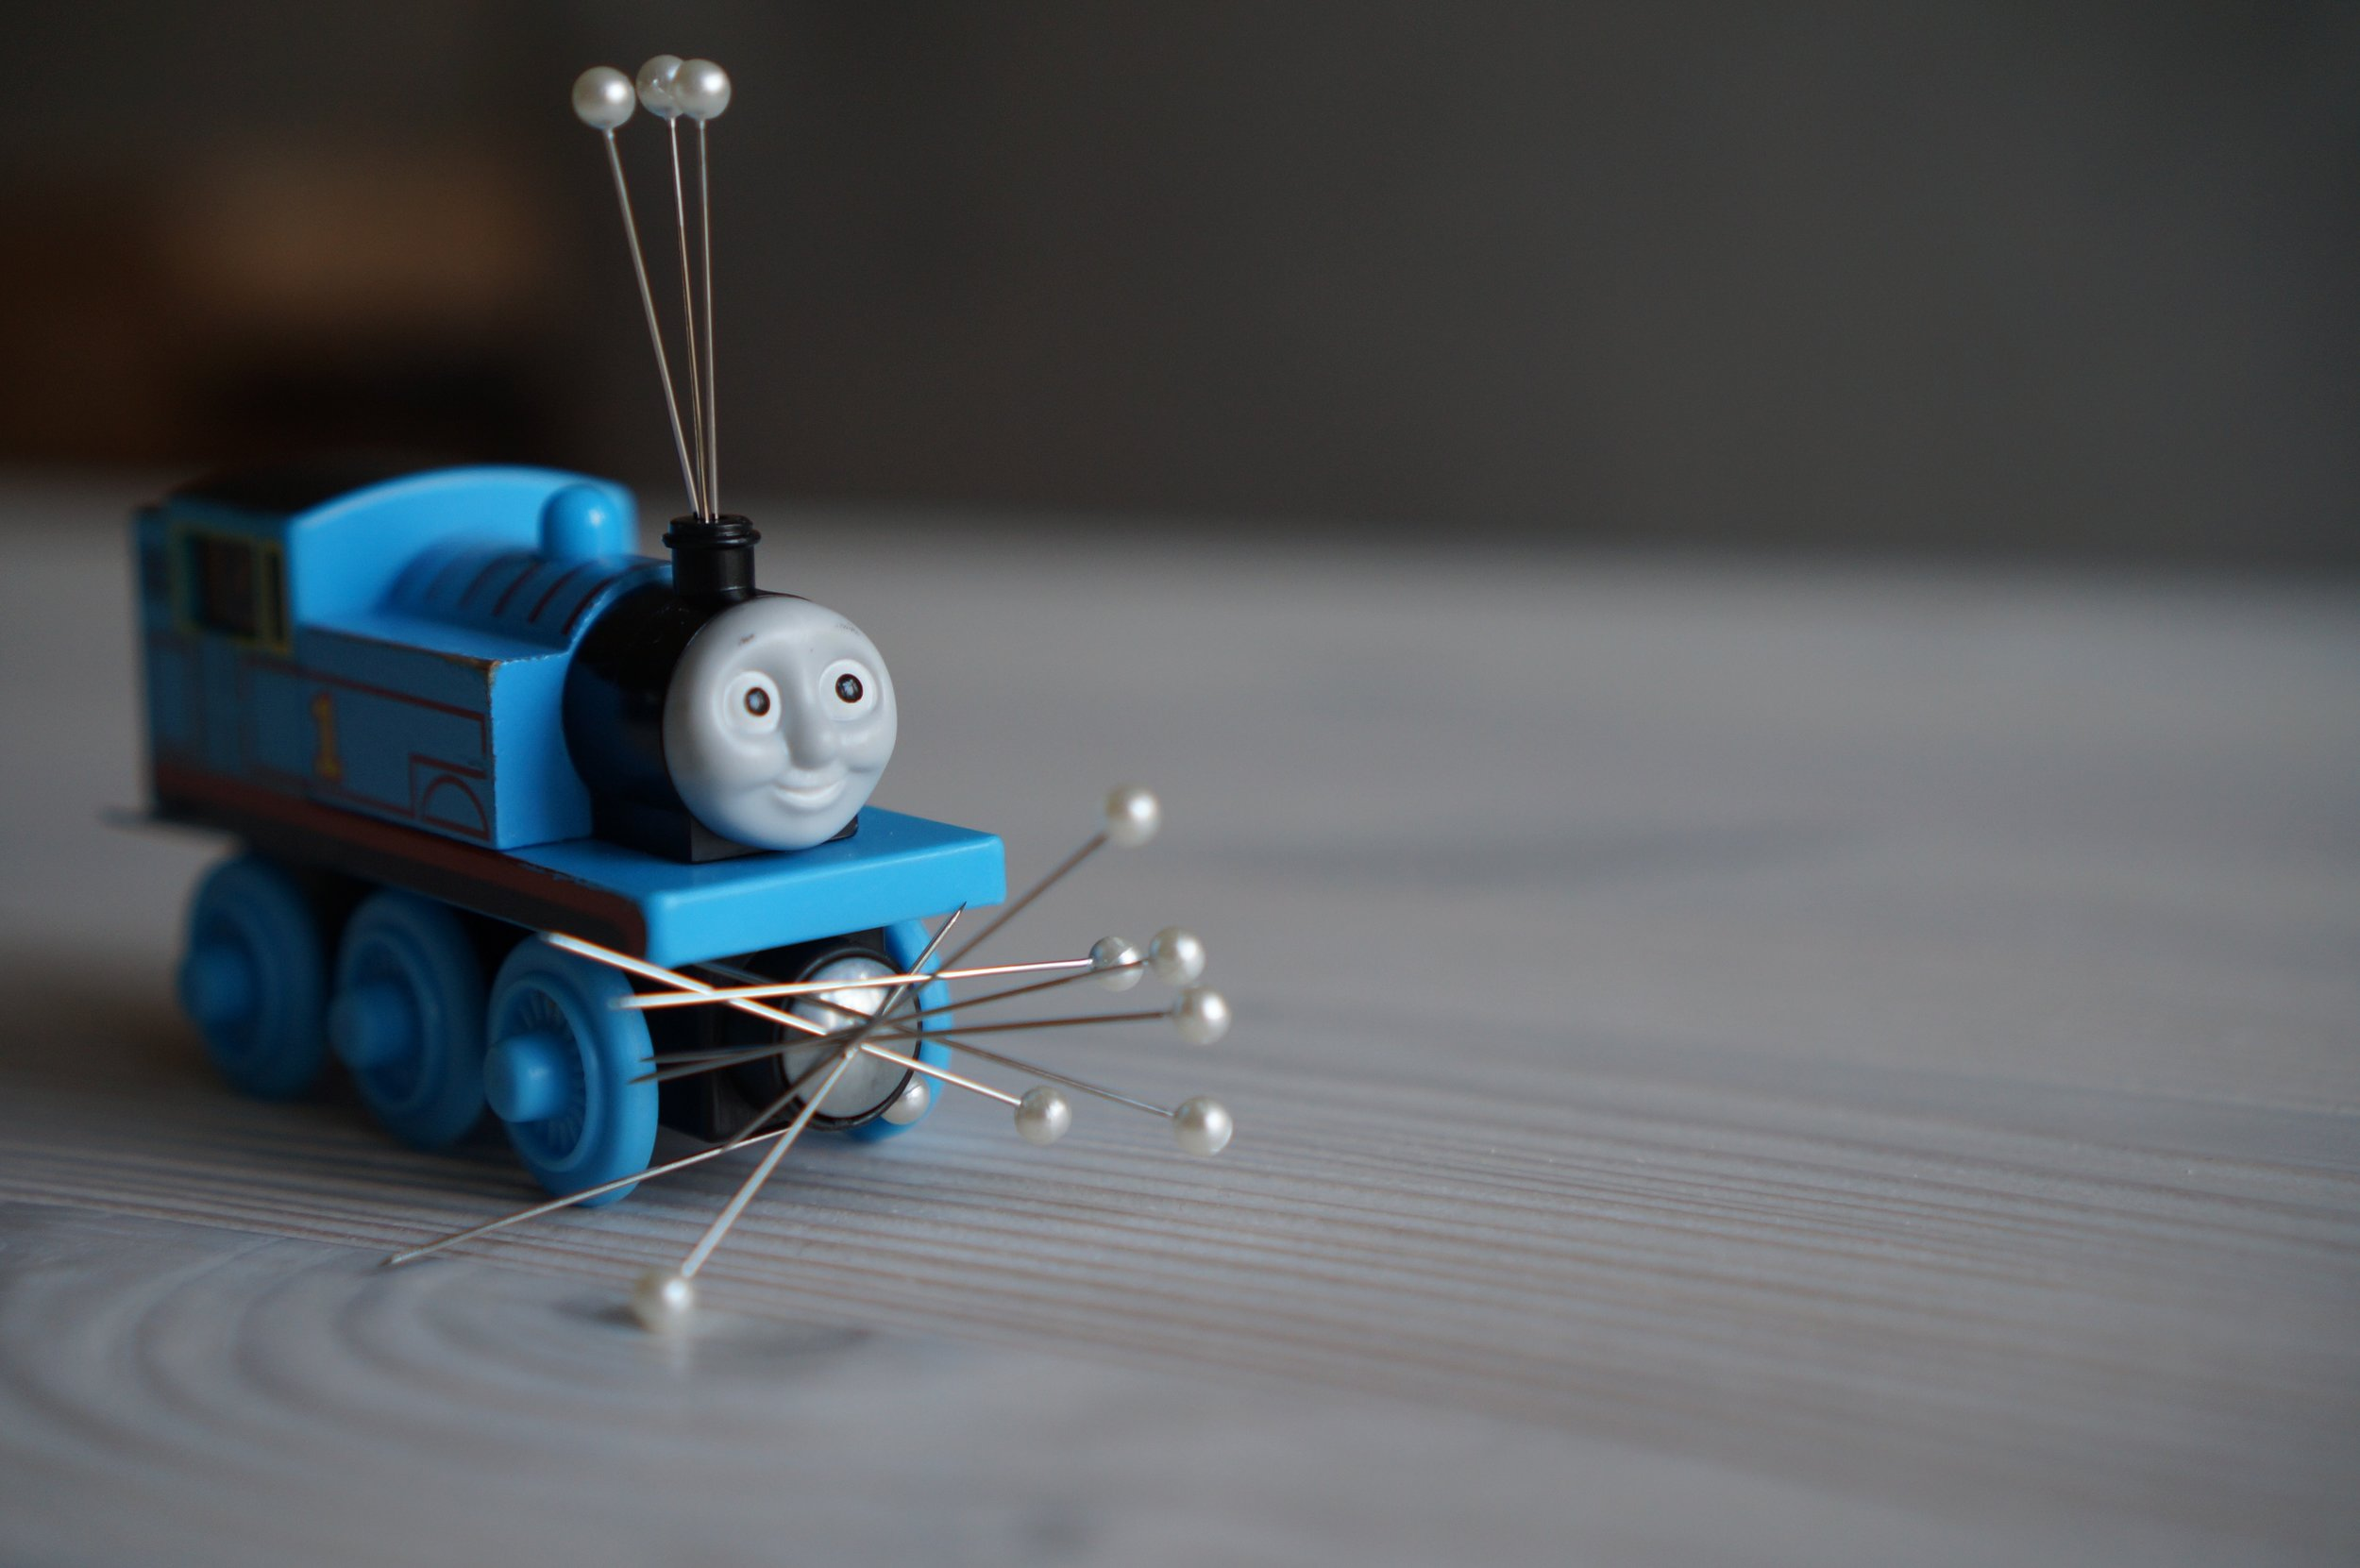 Thomas doubles as a pin cushion.